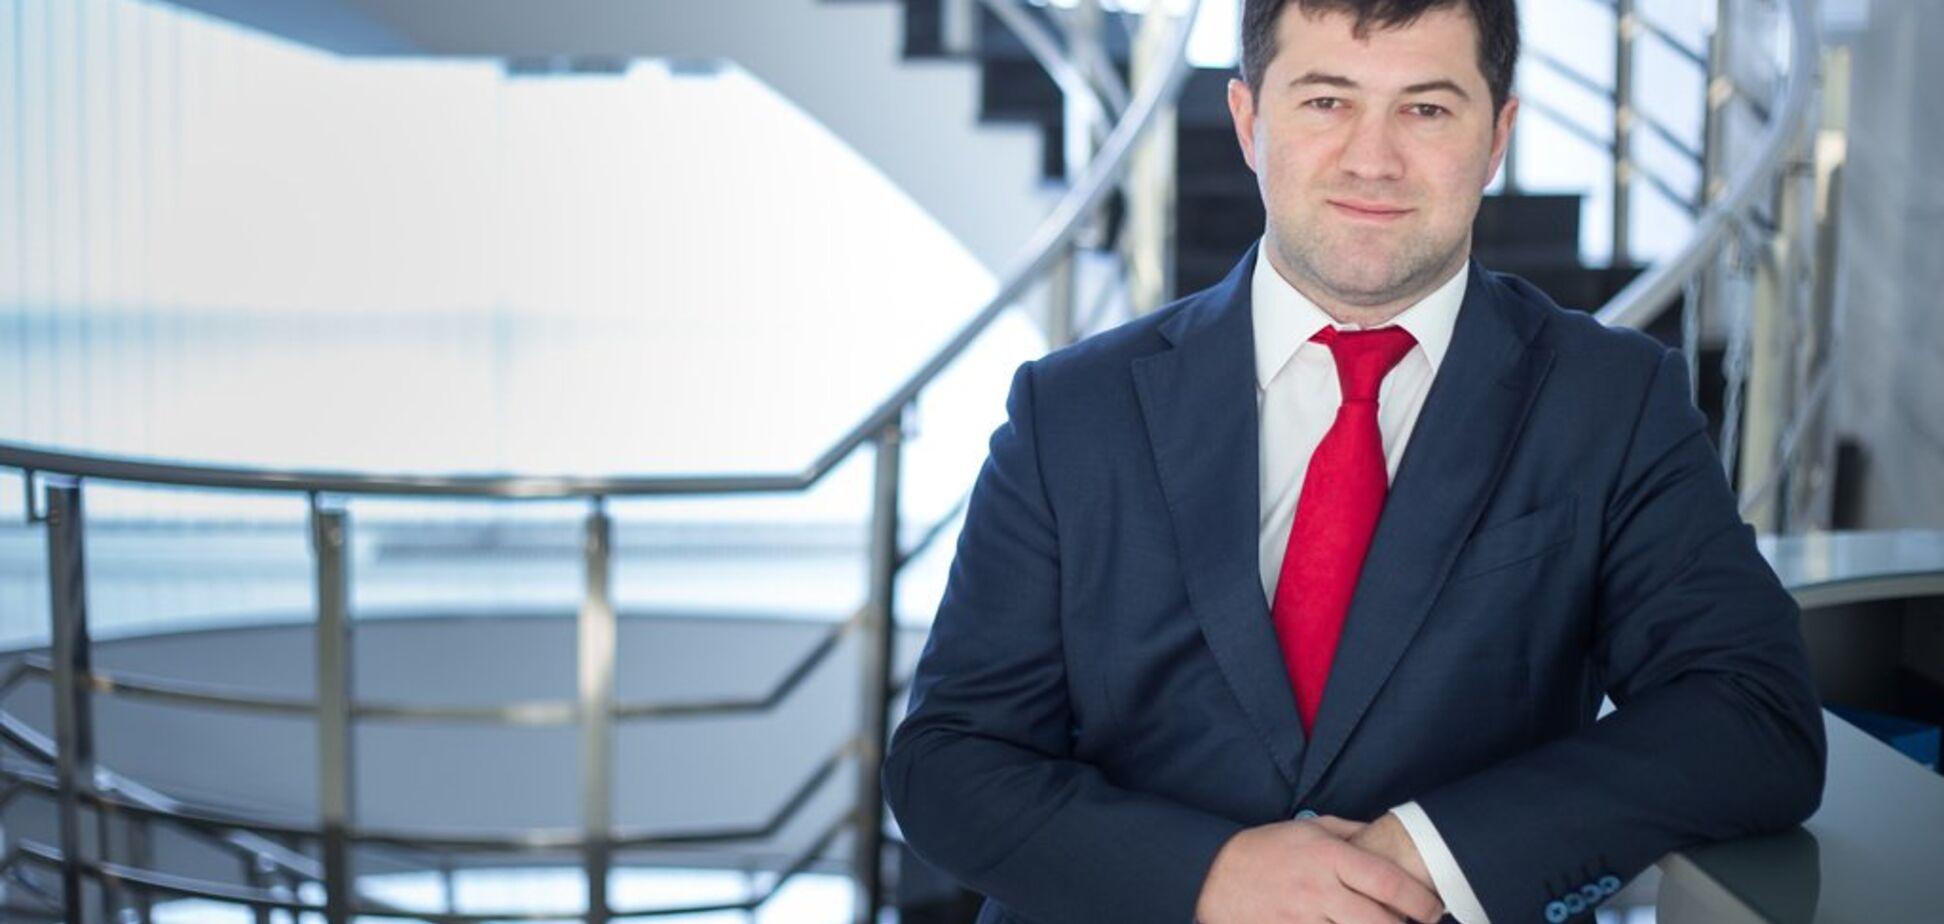 Насіров — знову голова ДФС: адвокат пояснив нюанси